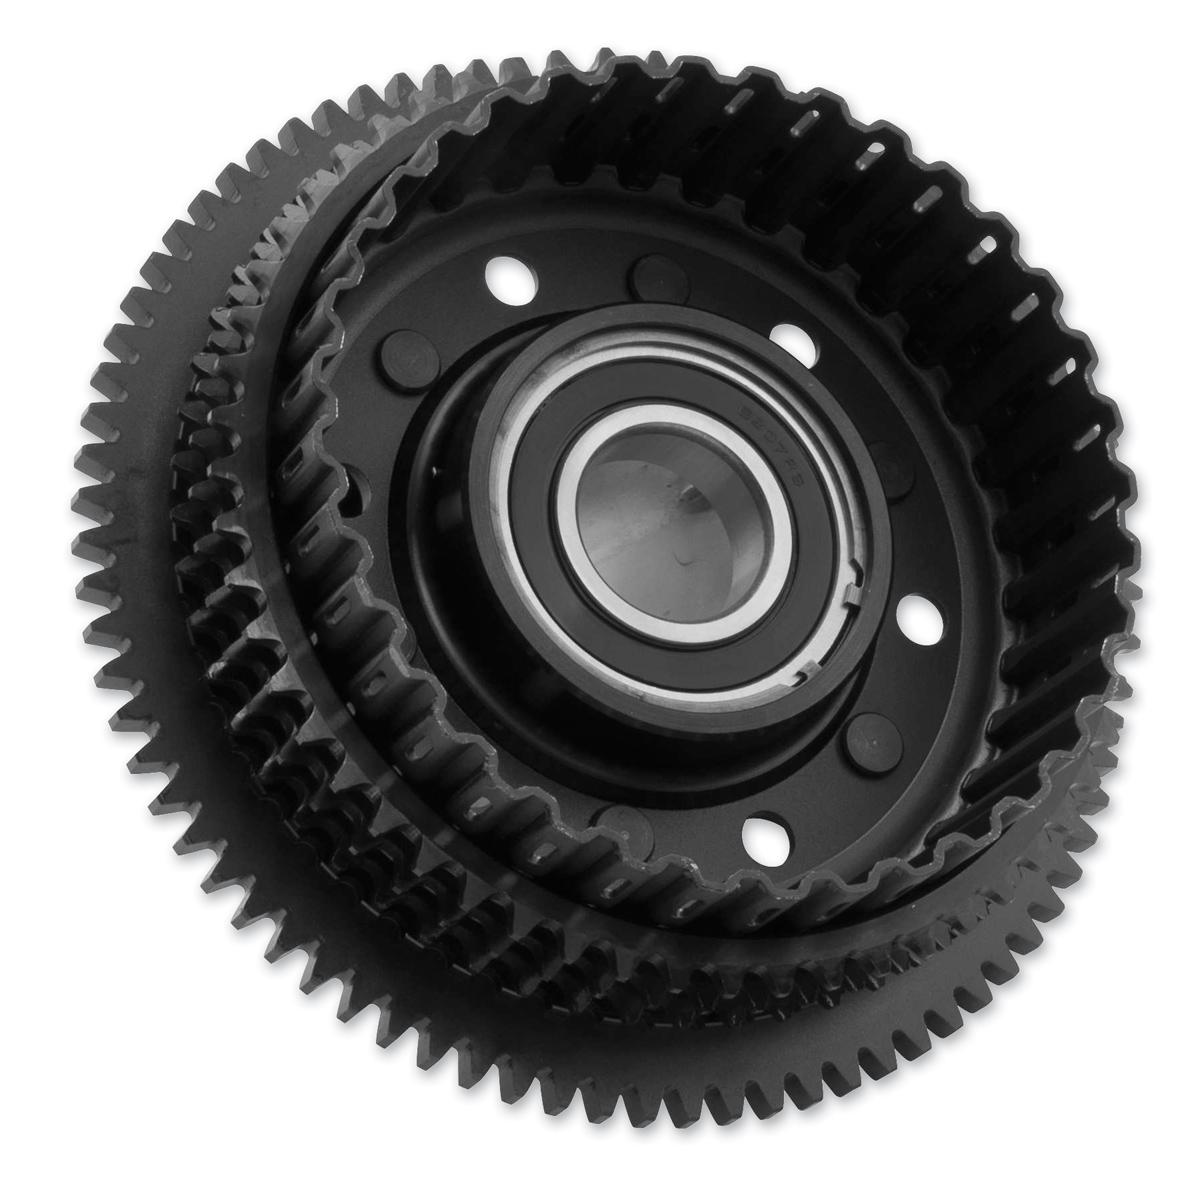 Twin Power Clutch Shell